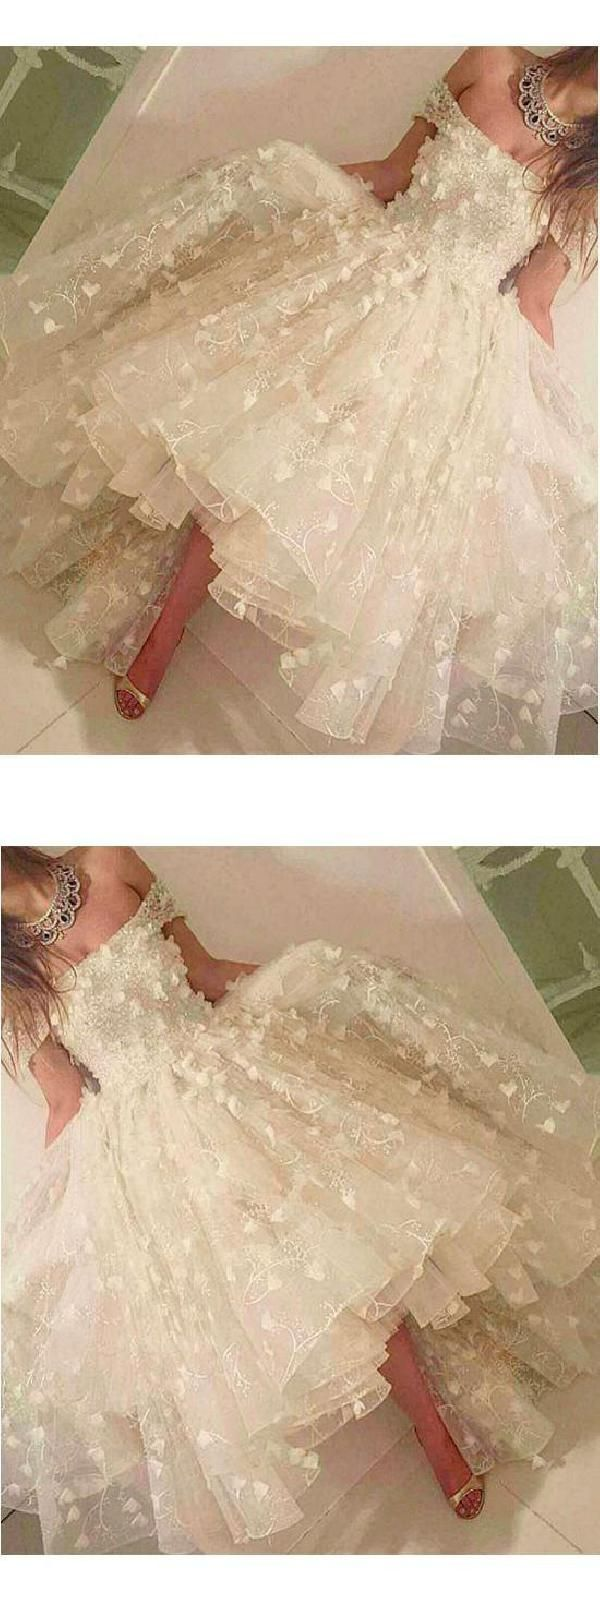 Prom dresses high low promdresseshighlow short homecoming dresses